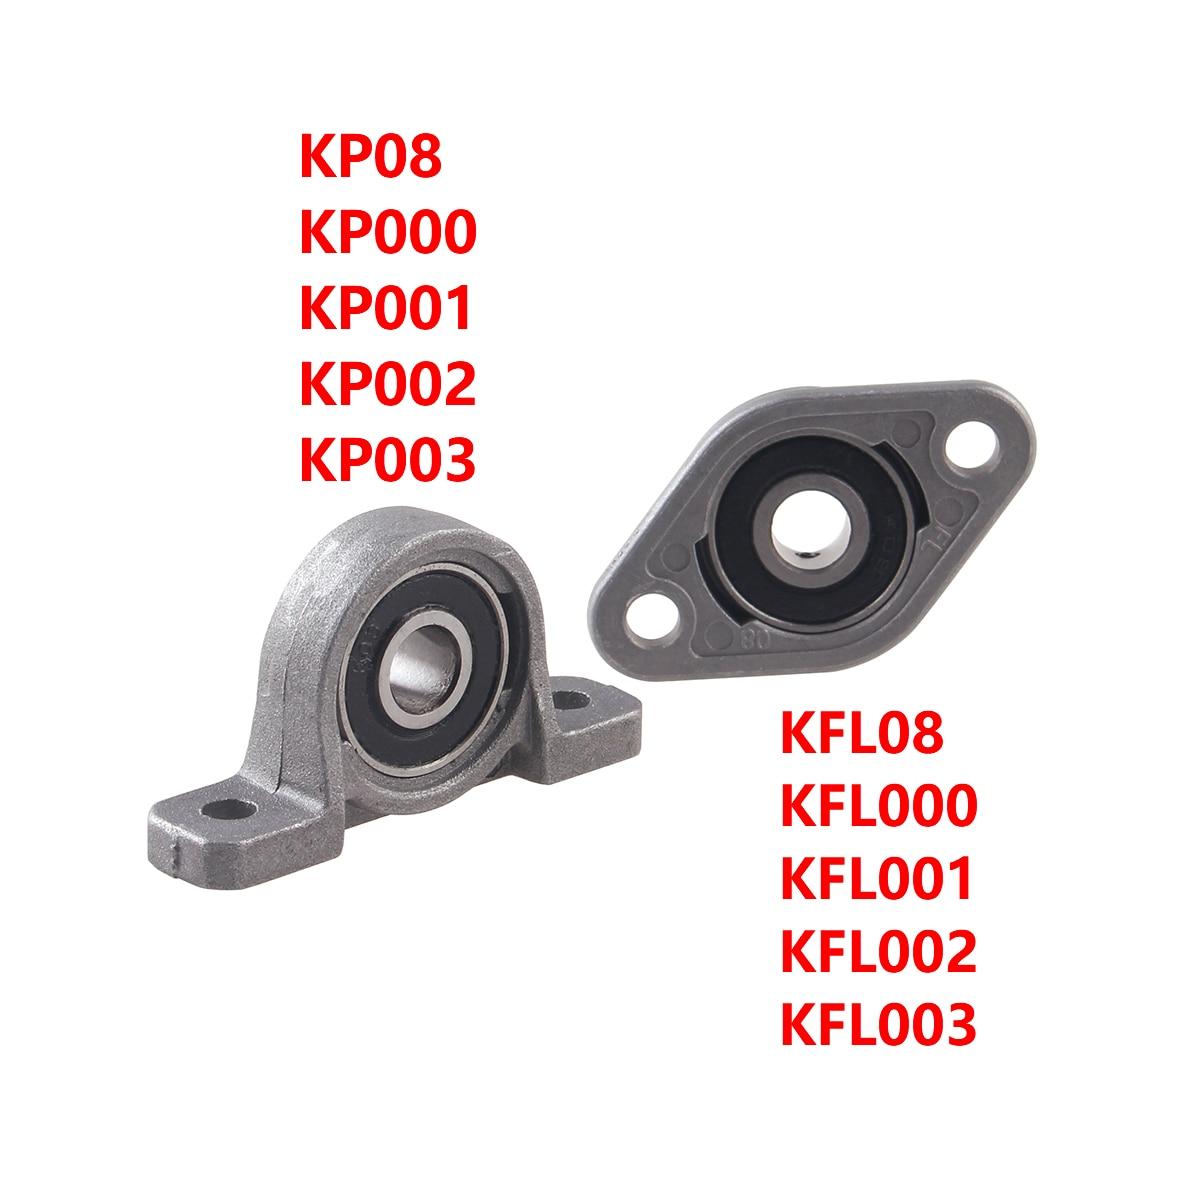 KP08 KP000 KP001 KFL08 Vertical Horizontal Zinc Alloy Mounted Bearing Mount Support Pillow Block Bearing CNC Printer Parts